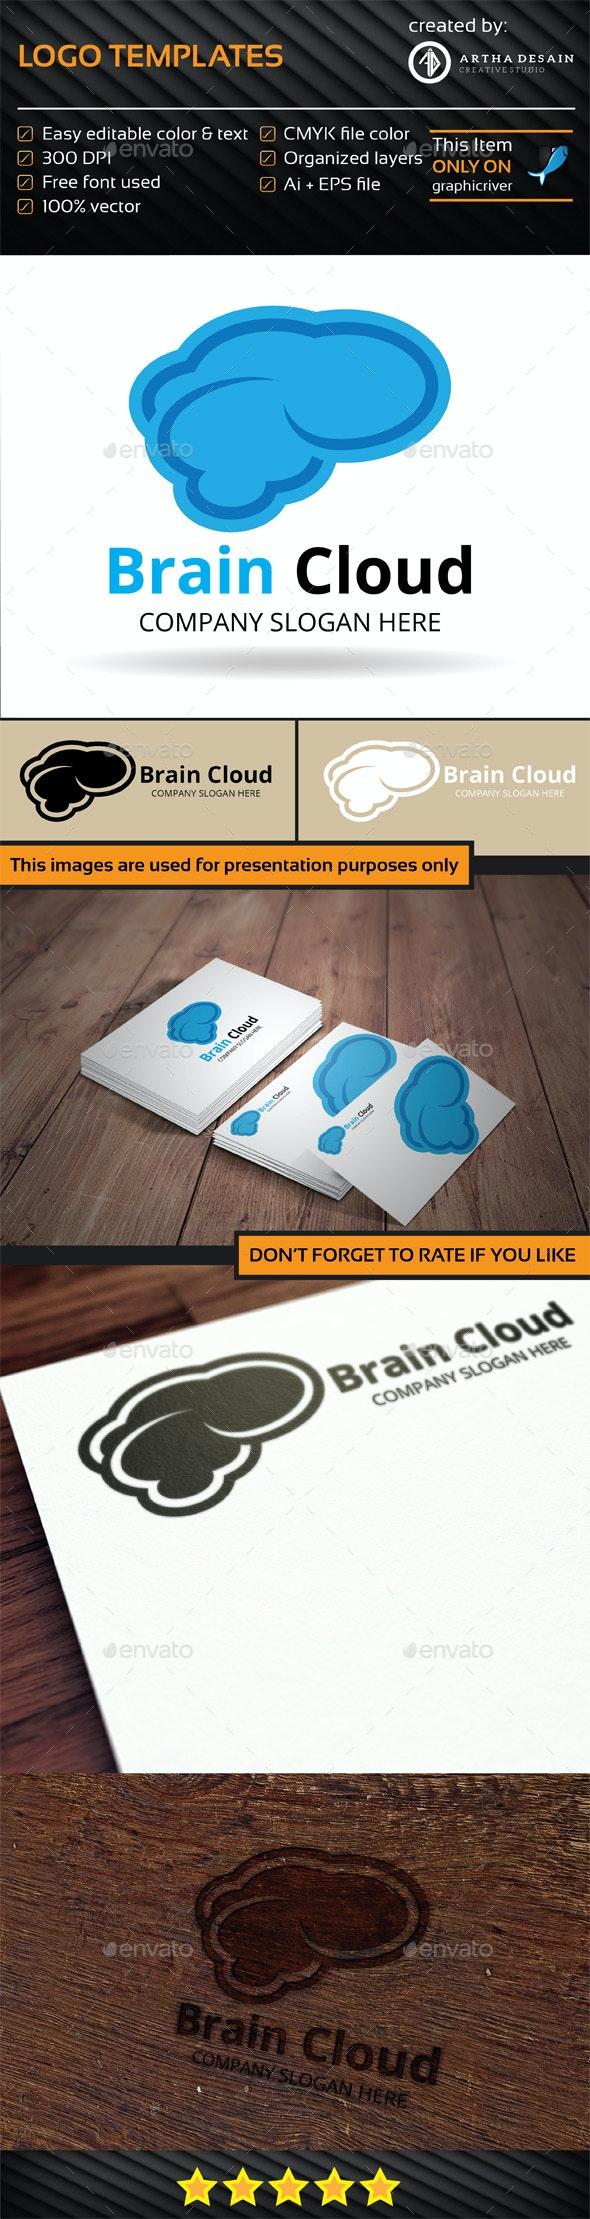 Brain Cloud - Logo Template - Logo Templates